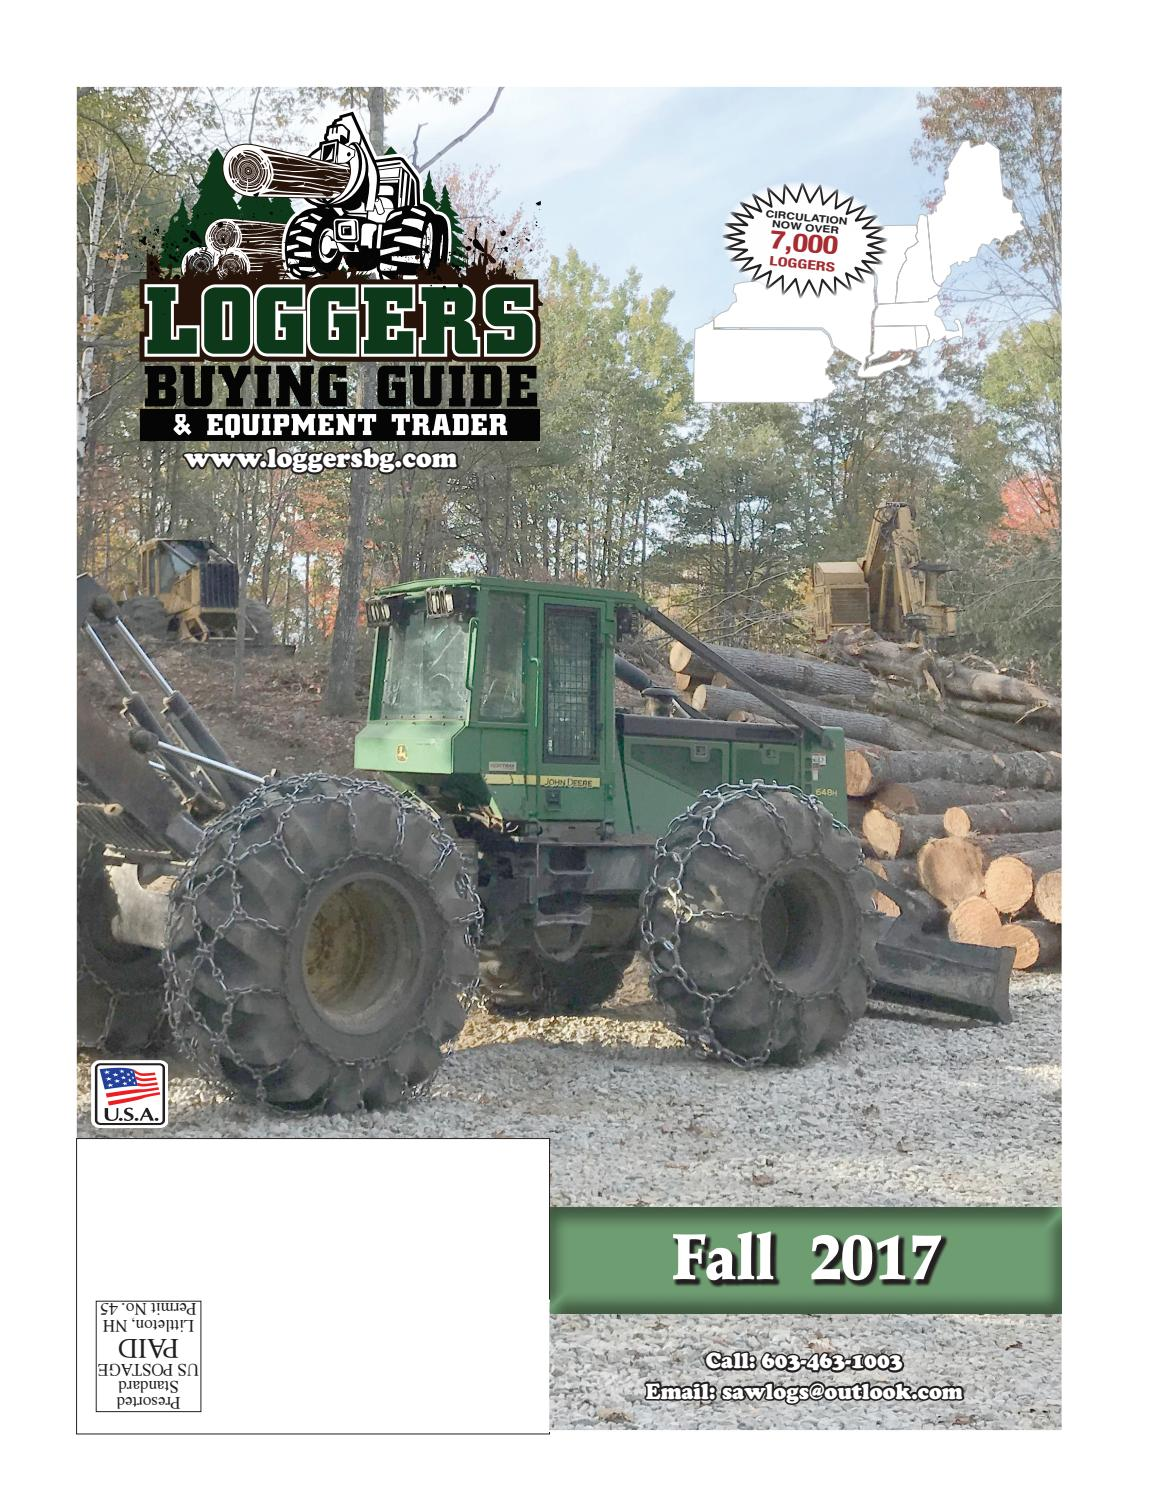 Fall Loggers Buying Guide 2017 by Log Street Publishers, LLC - issuu